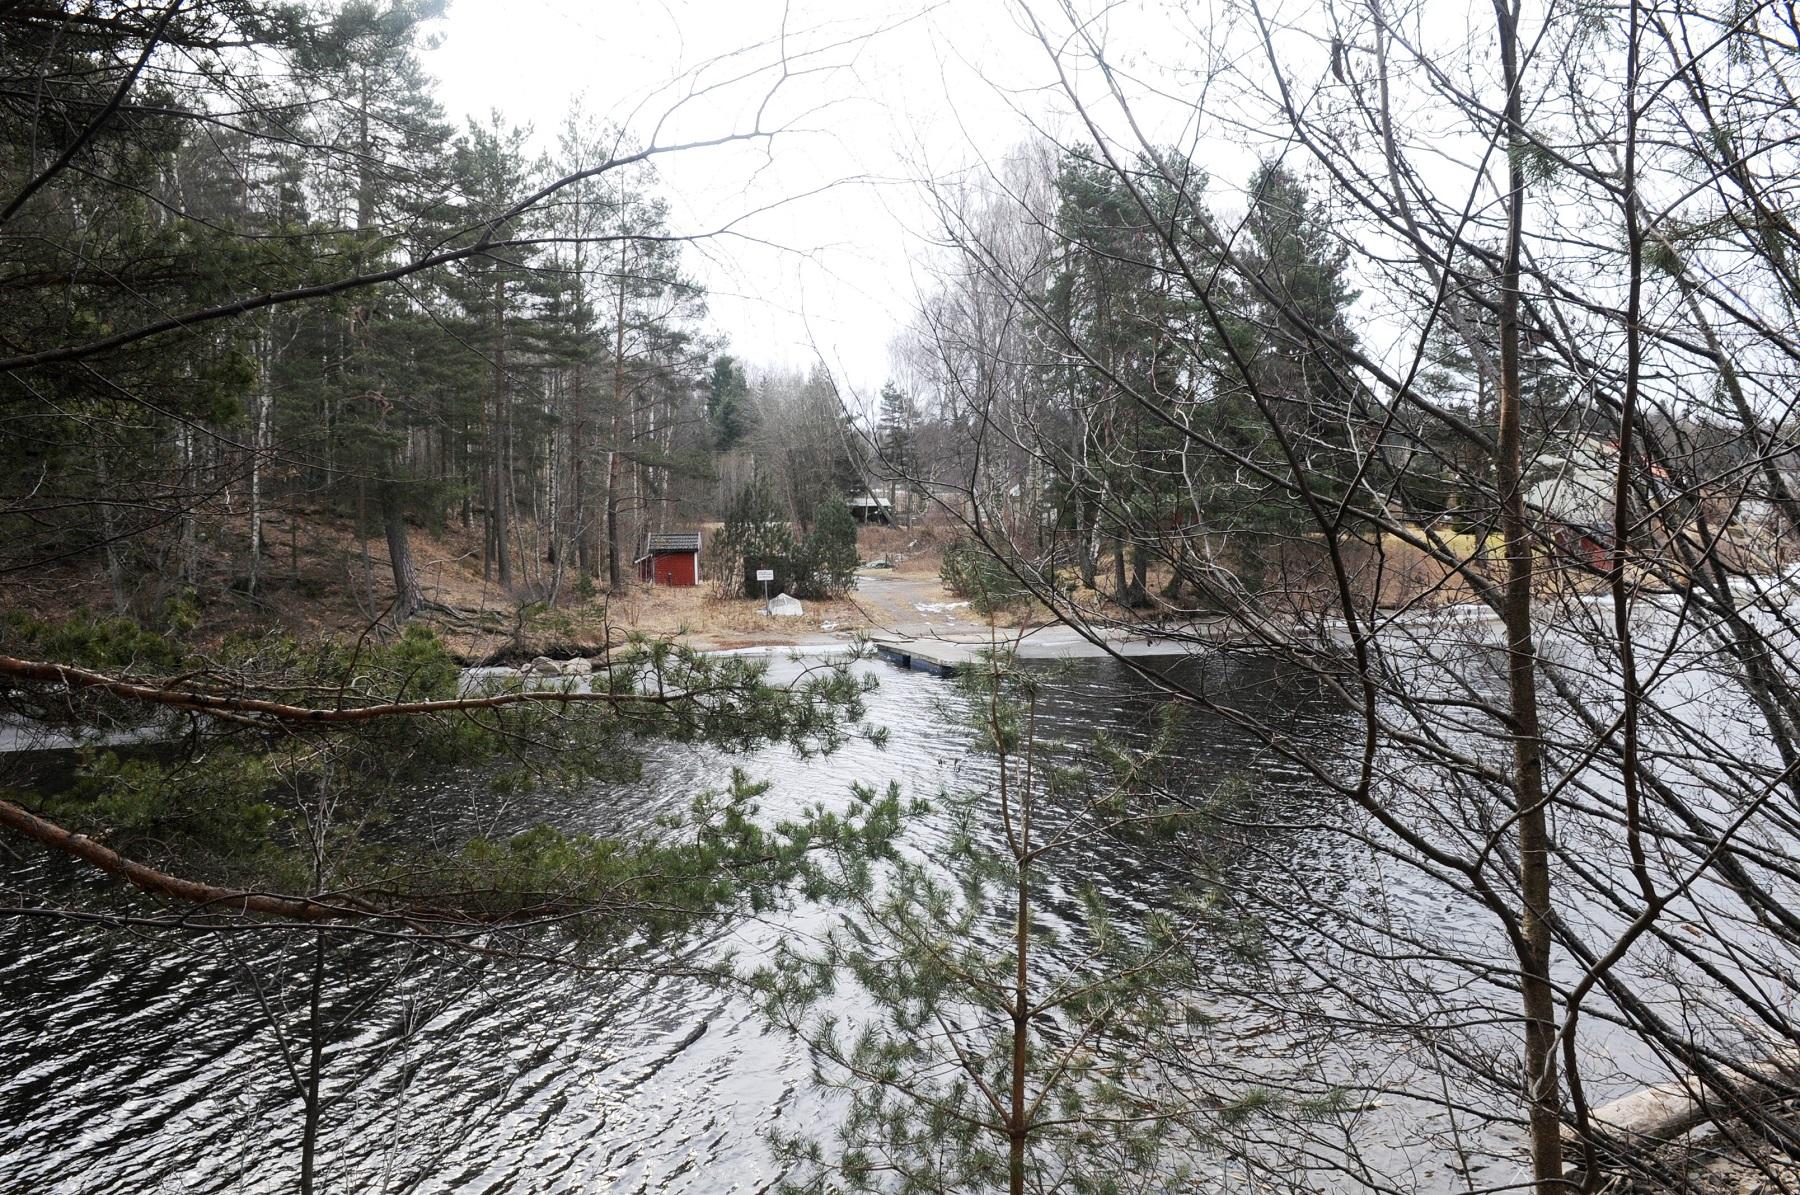 Veden-vadet - det gamle vadestedet over Tista. Foto: Svein Norheim, Østfoldmuseene Halden historiske Samlinger.